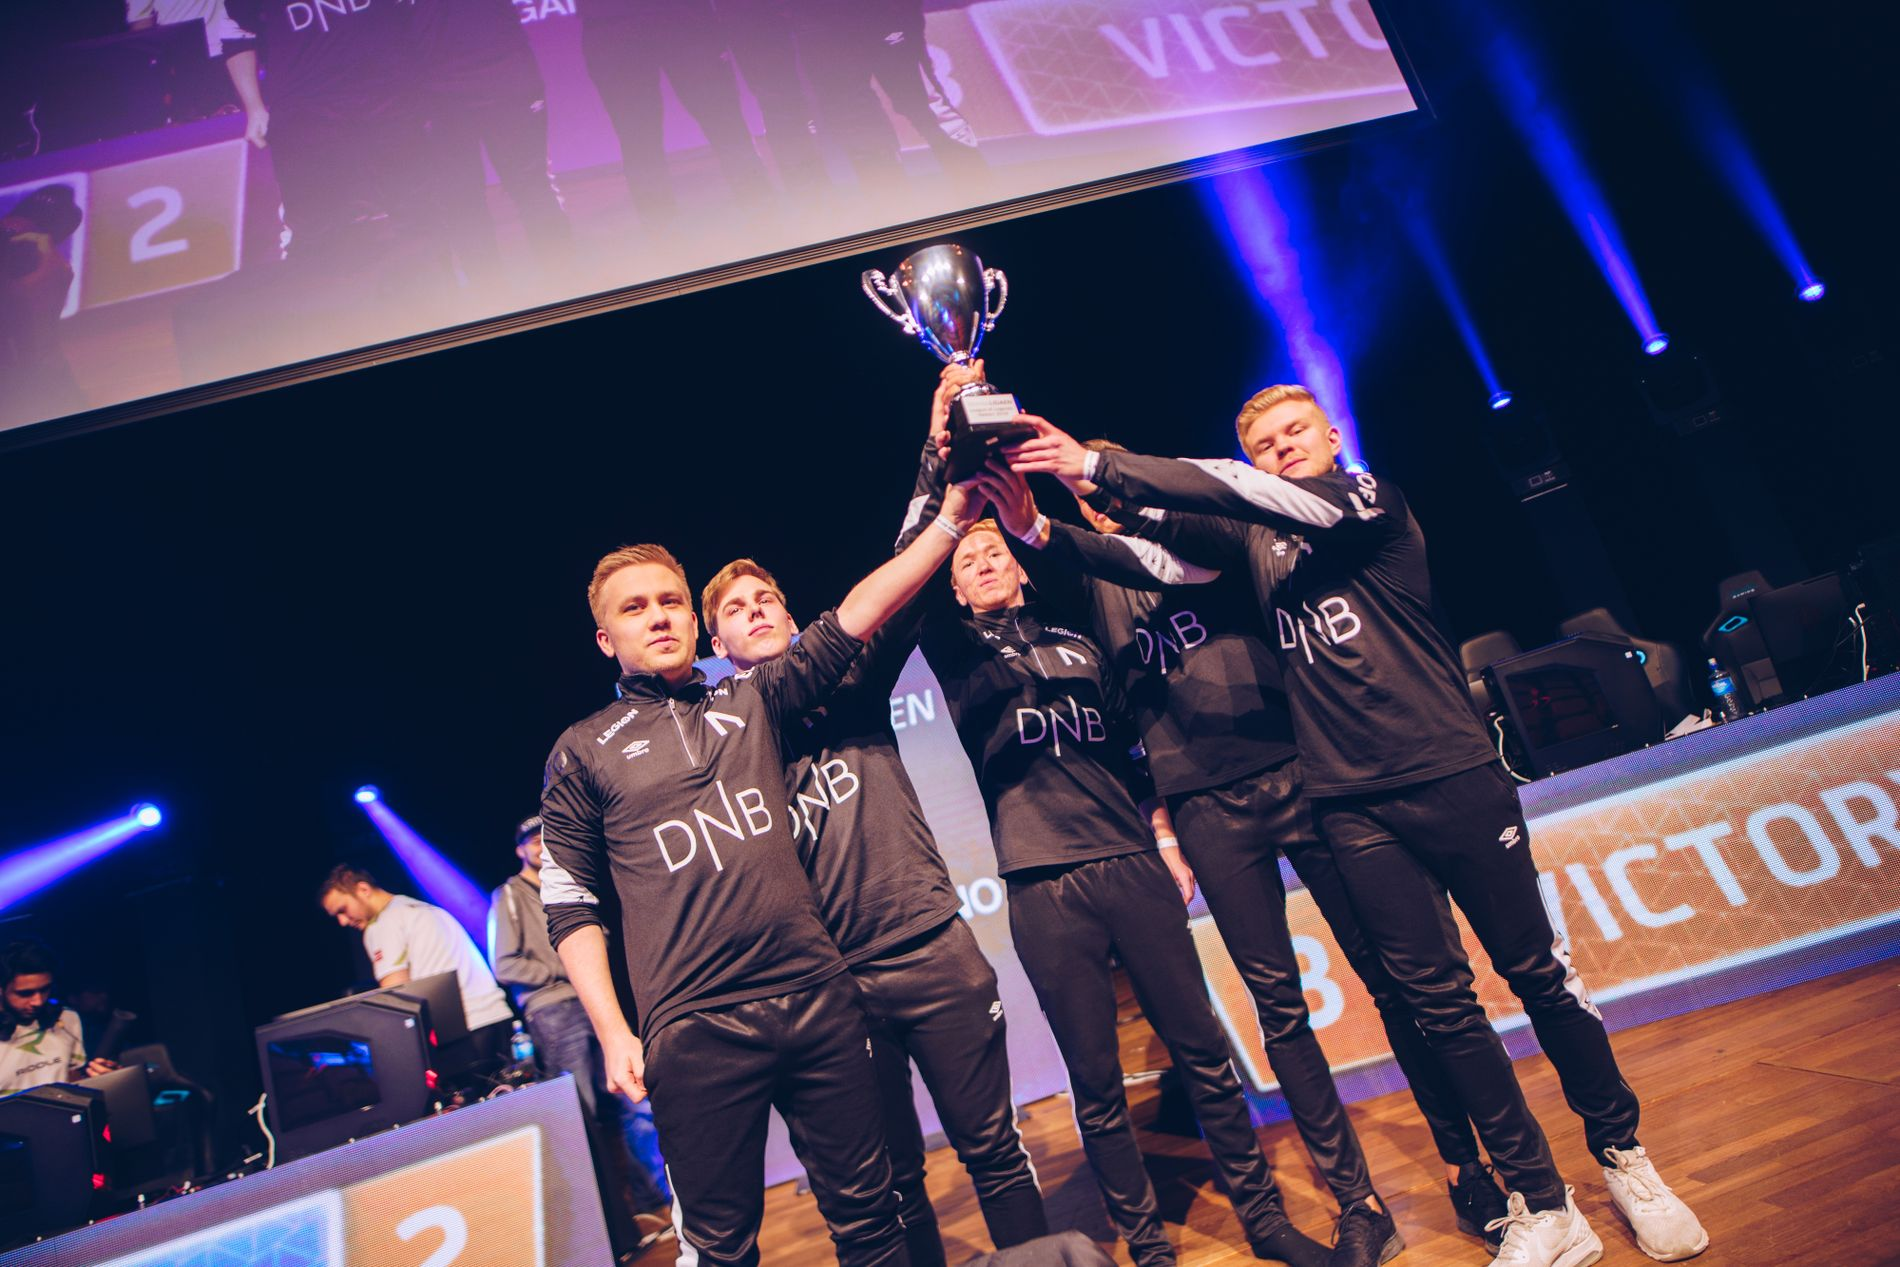 TO PÅ RAD: Nordavind dominerte fjoråret med seier i begge sesongfinalene.